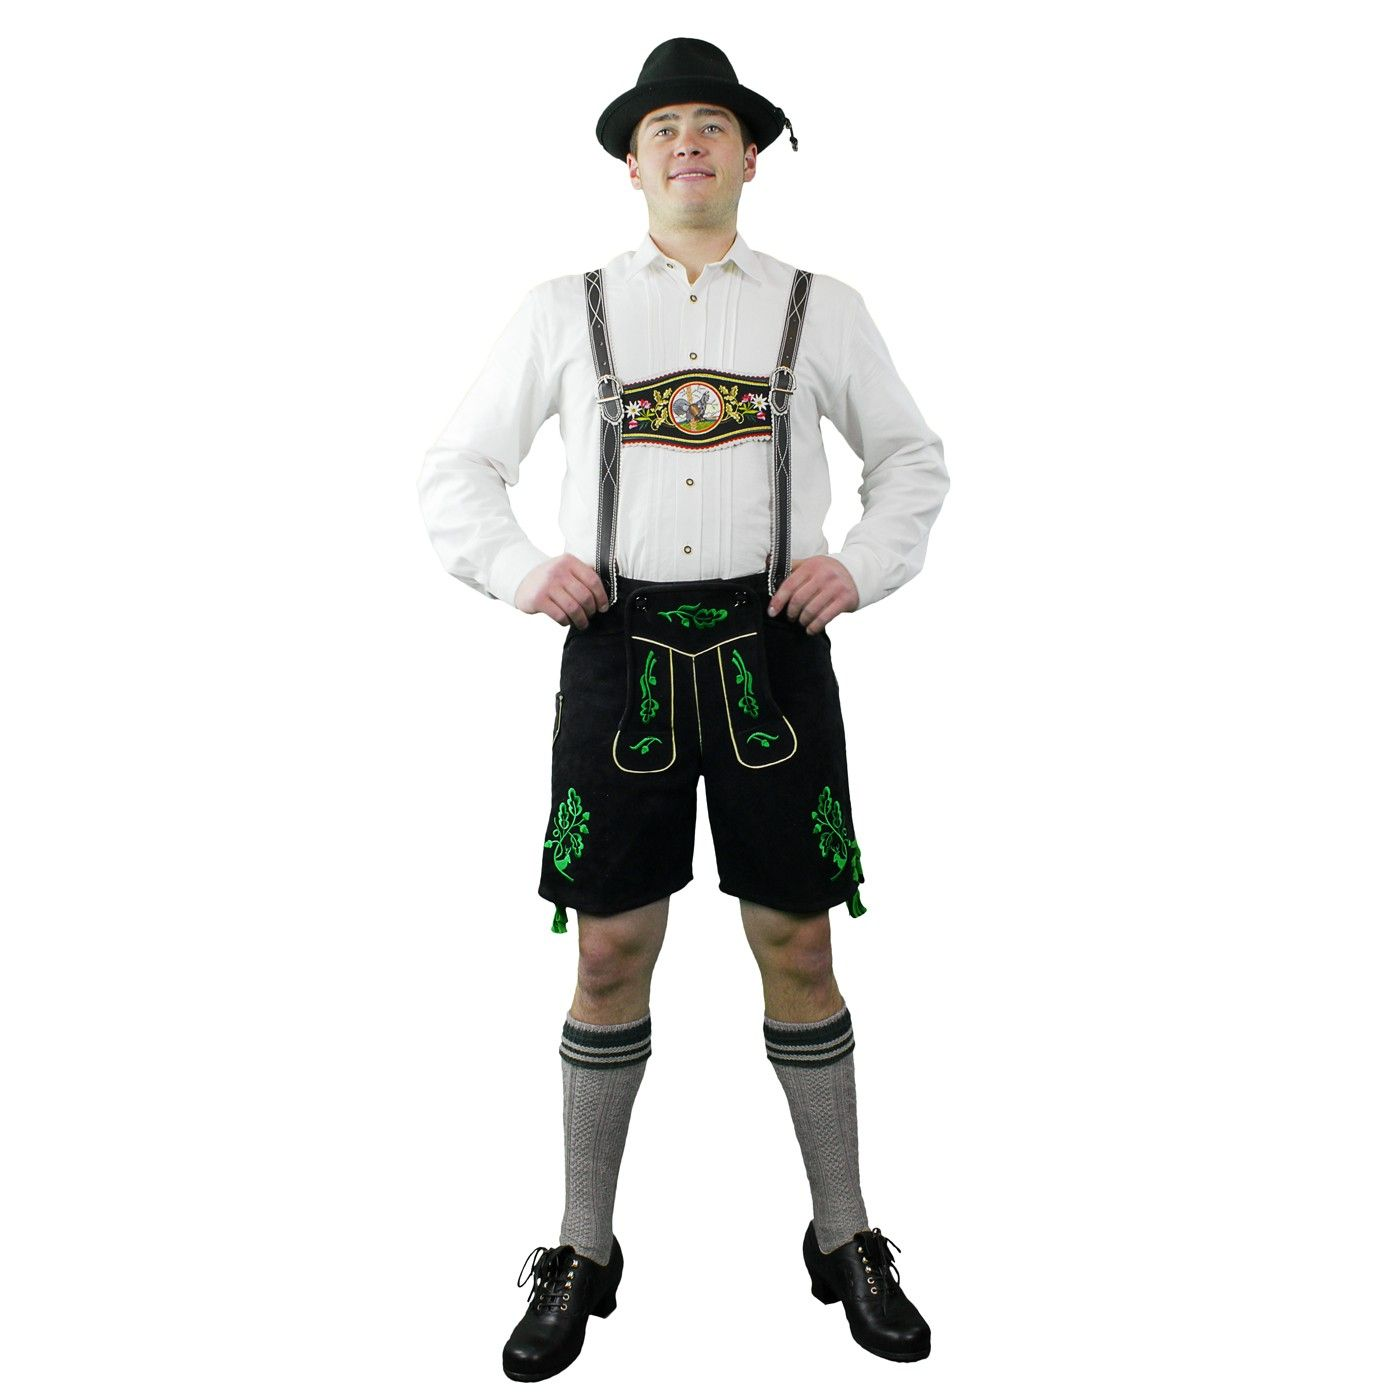 Authentic lederhosen German bavarian lederhosen men trachten wear oktoberfest